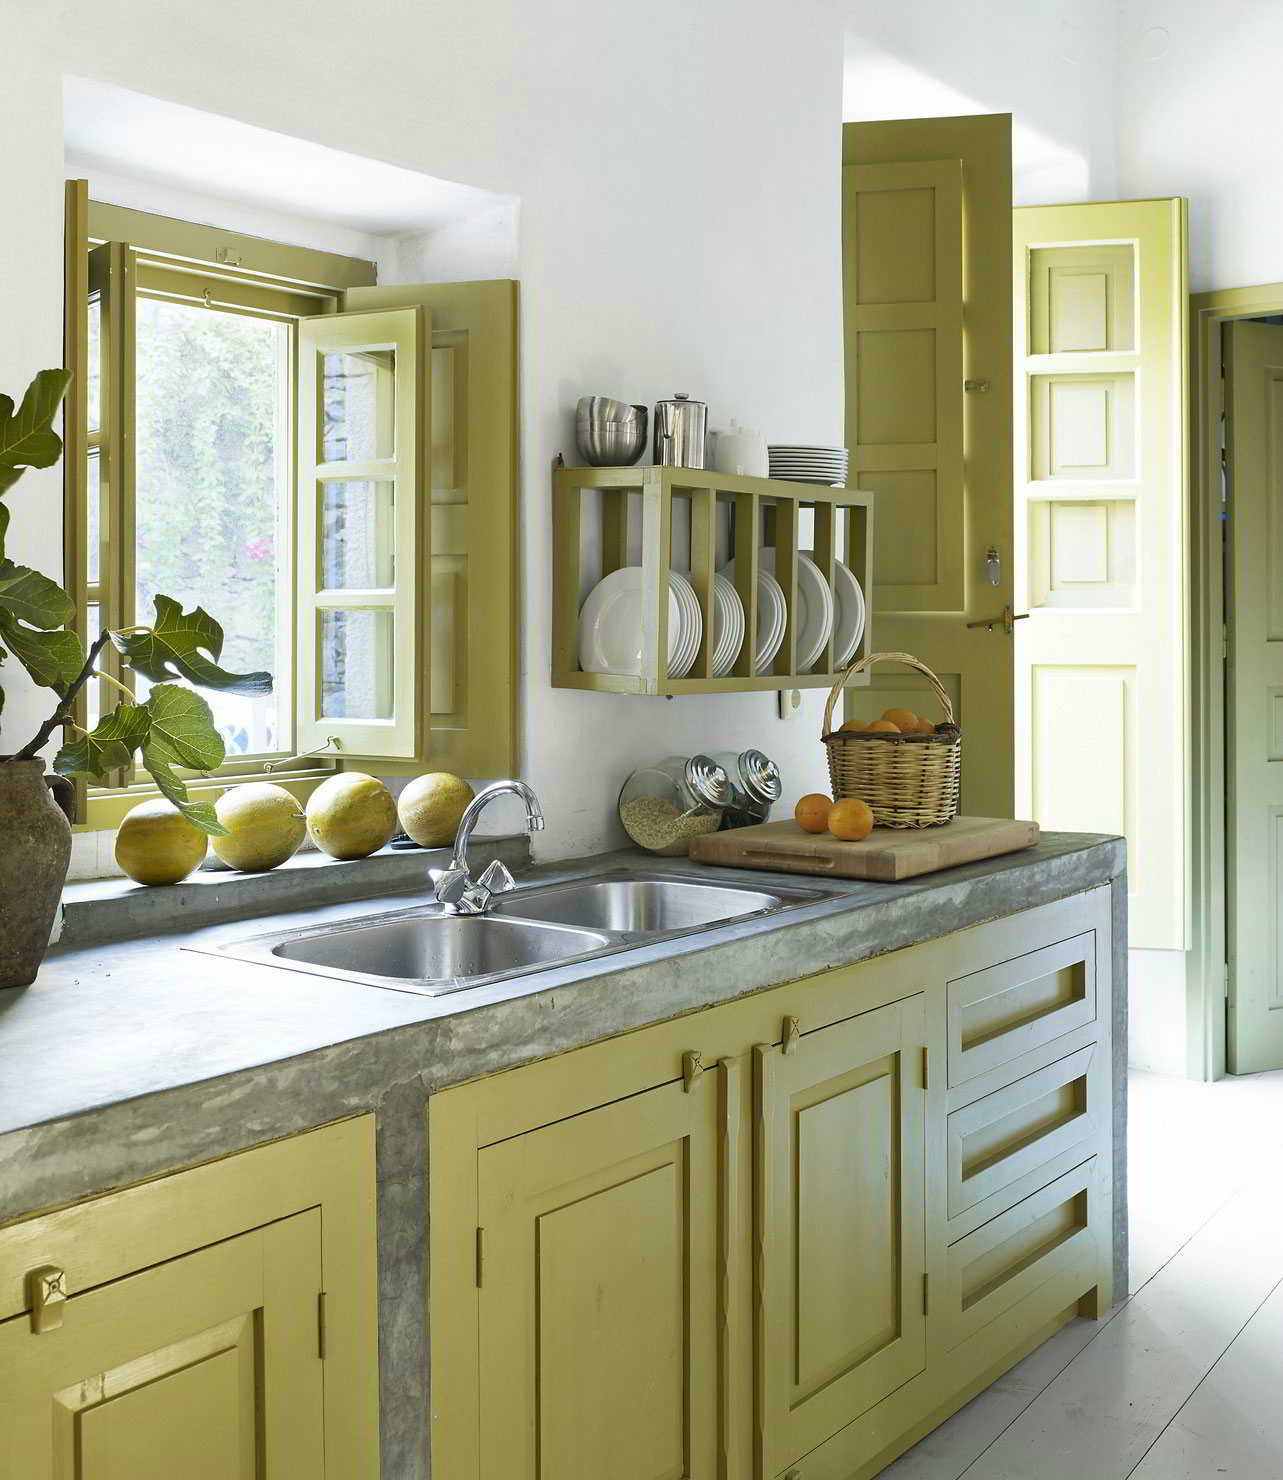 kesan alami dari dapur dengan warna hijau yang segar » Kegiatan Memasak Menjadi Lebih Menyenangkan di Dapur yang Menggembirakan